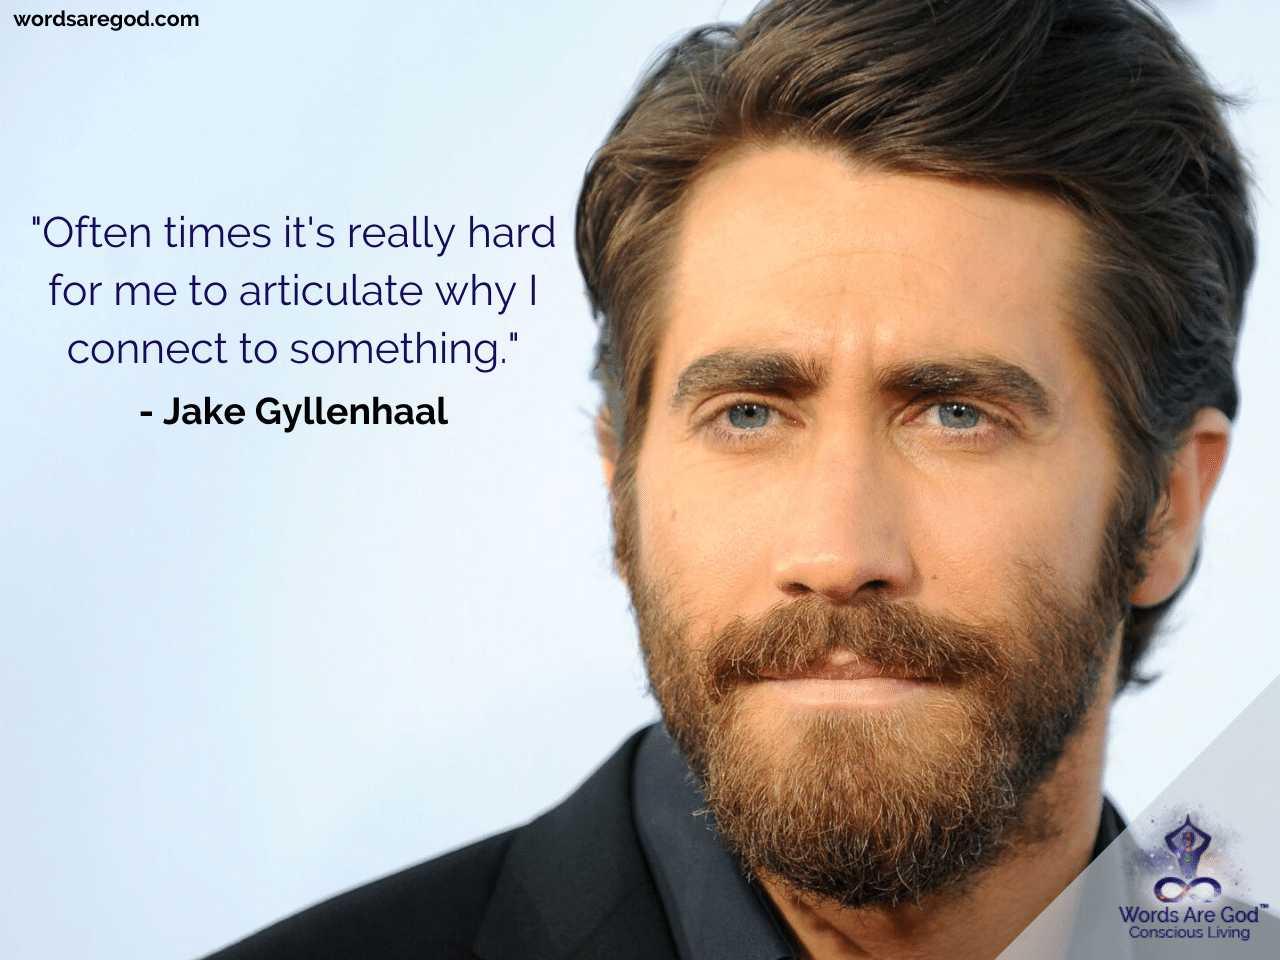 Jake Gyllenhaal Life Quotes by Jake Gyllenhaal